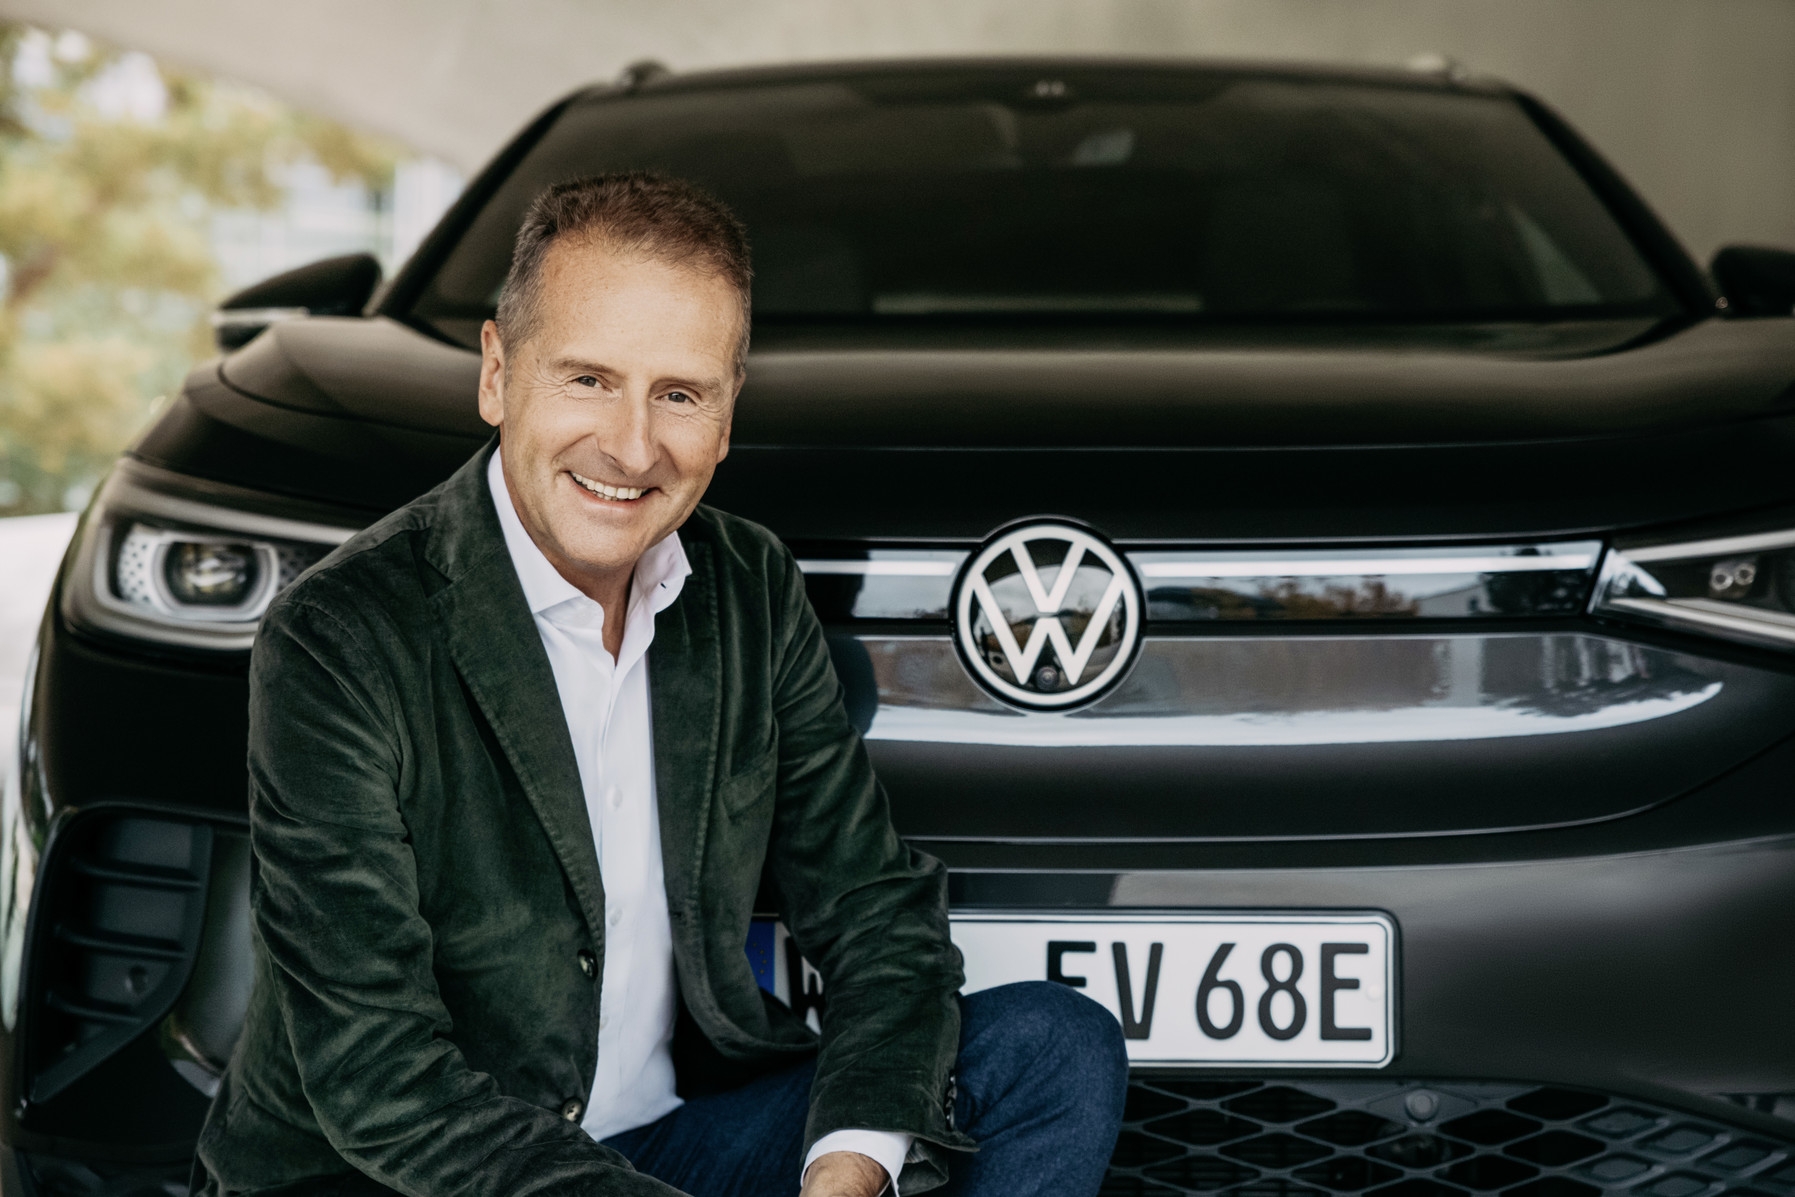 Herbert Diess encabezará Grupo Volkswagen hasta 2025